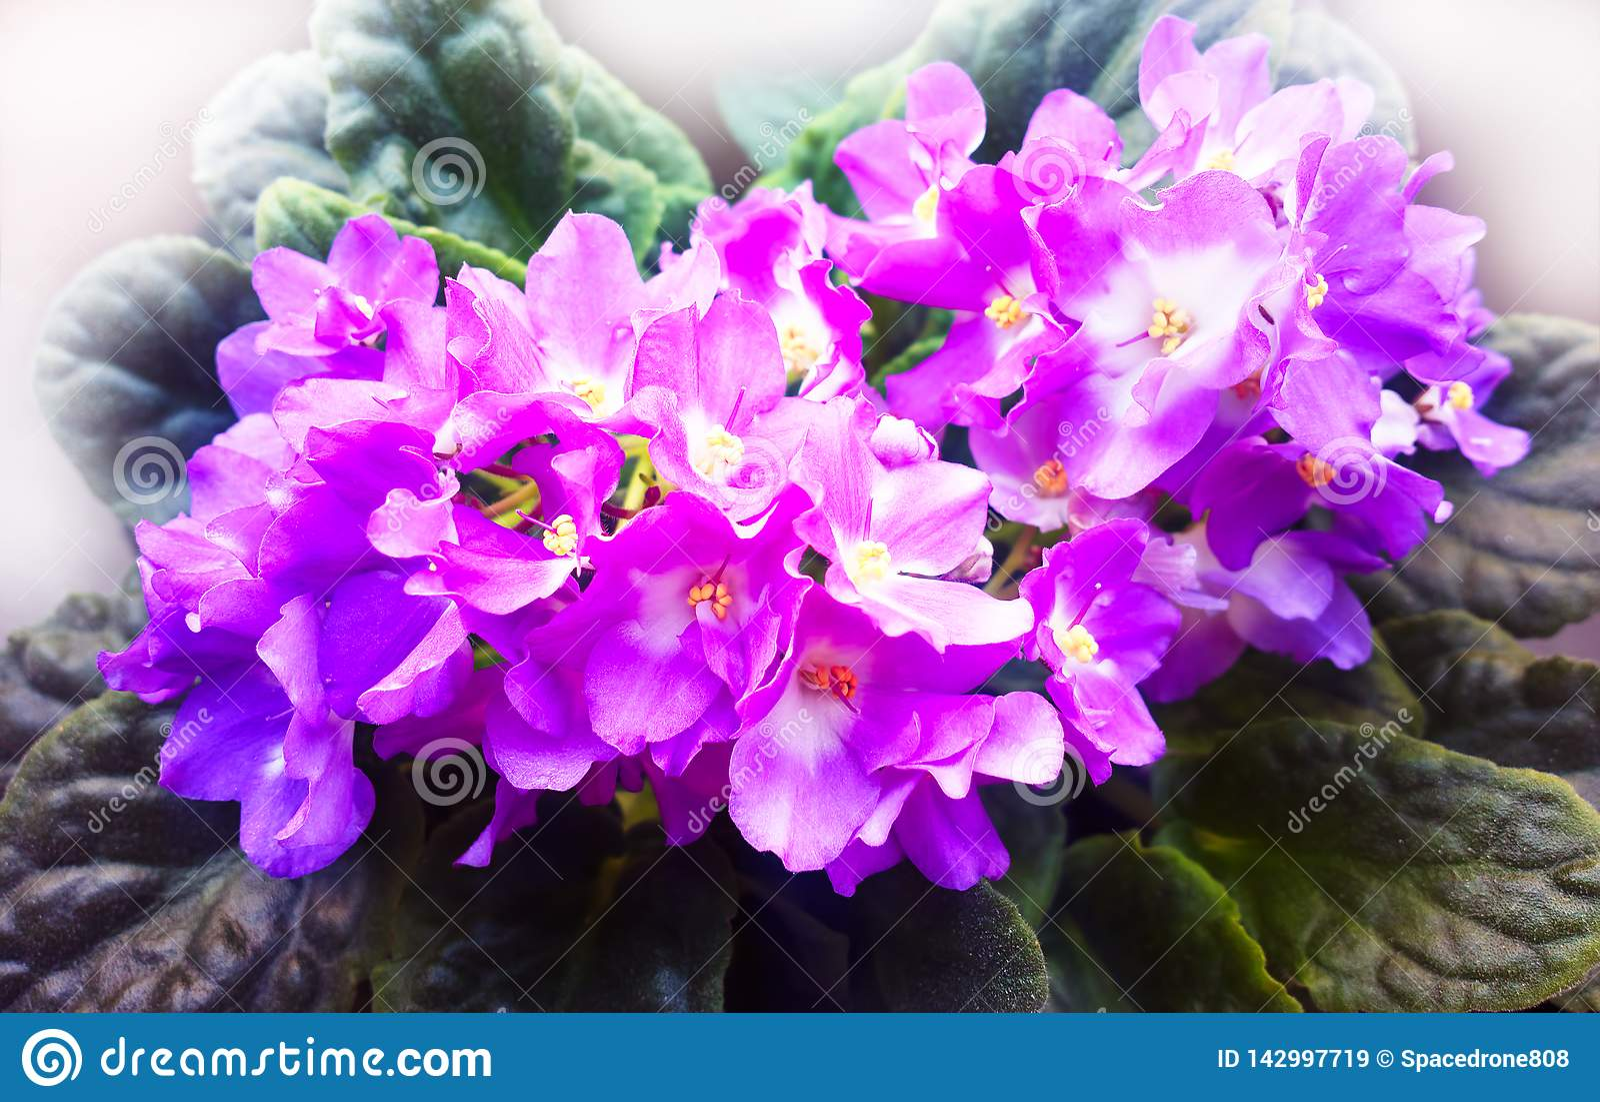 Vibrant Violets On Window Flower Background Stock Image